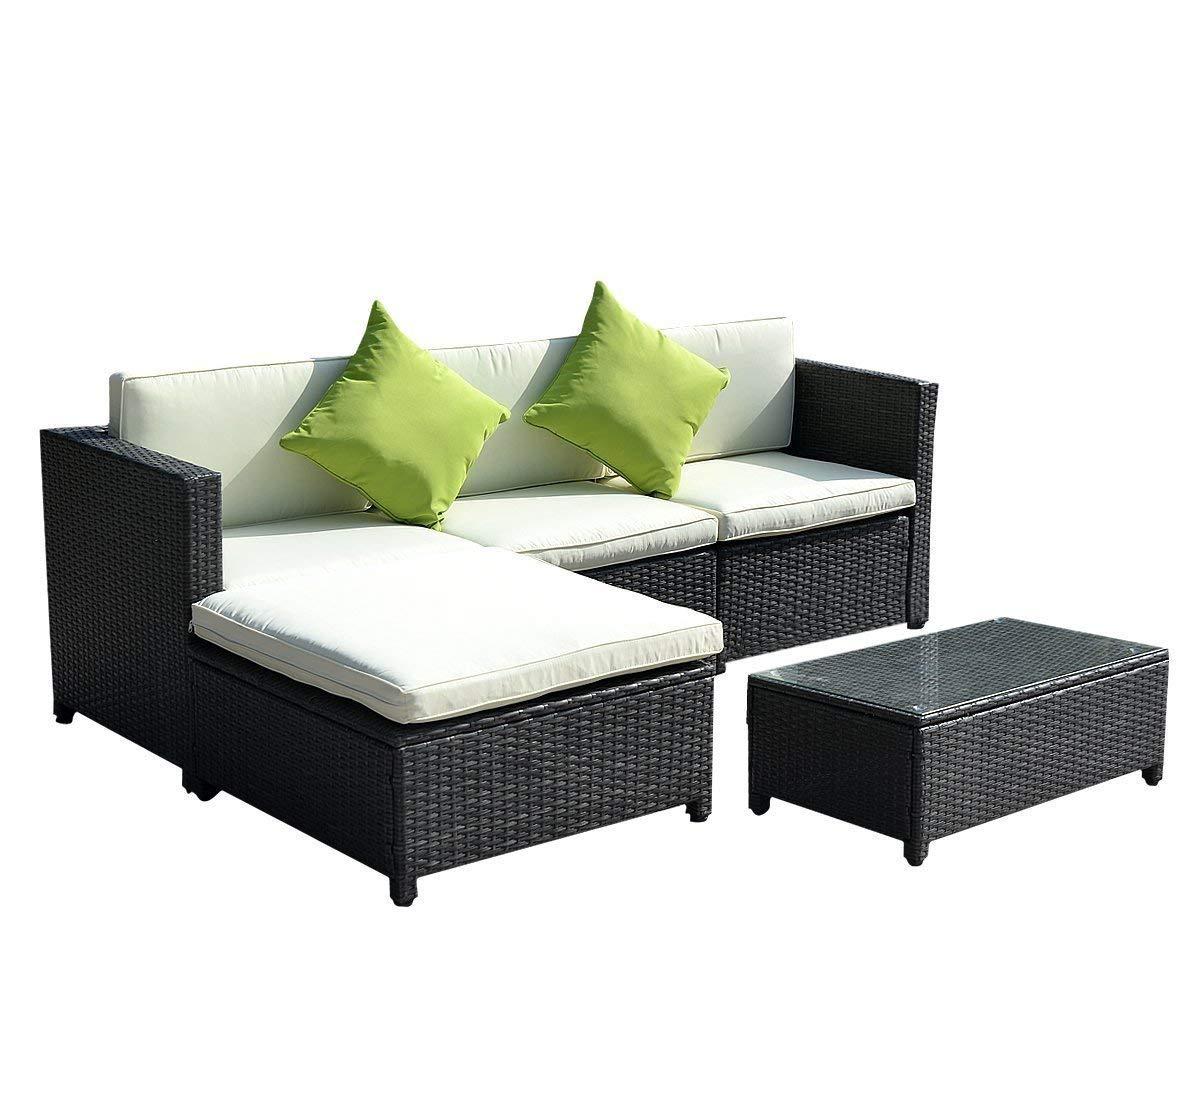 wicker sofa amazon.com: goplus® outdoor patio 5pc furniture sectional pe wicker rattan  sofa HKBNNZB